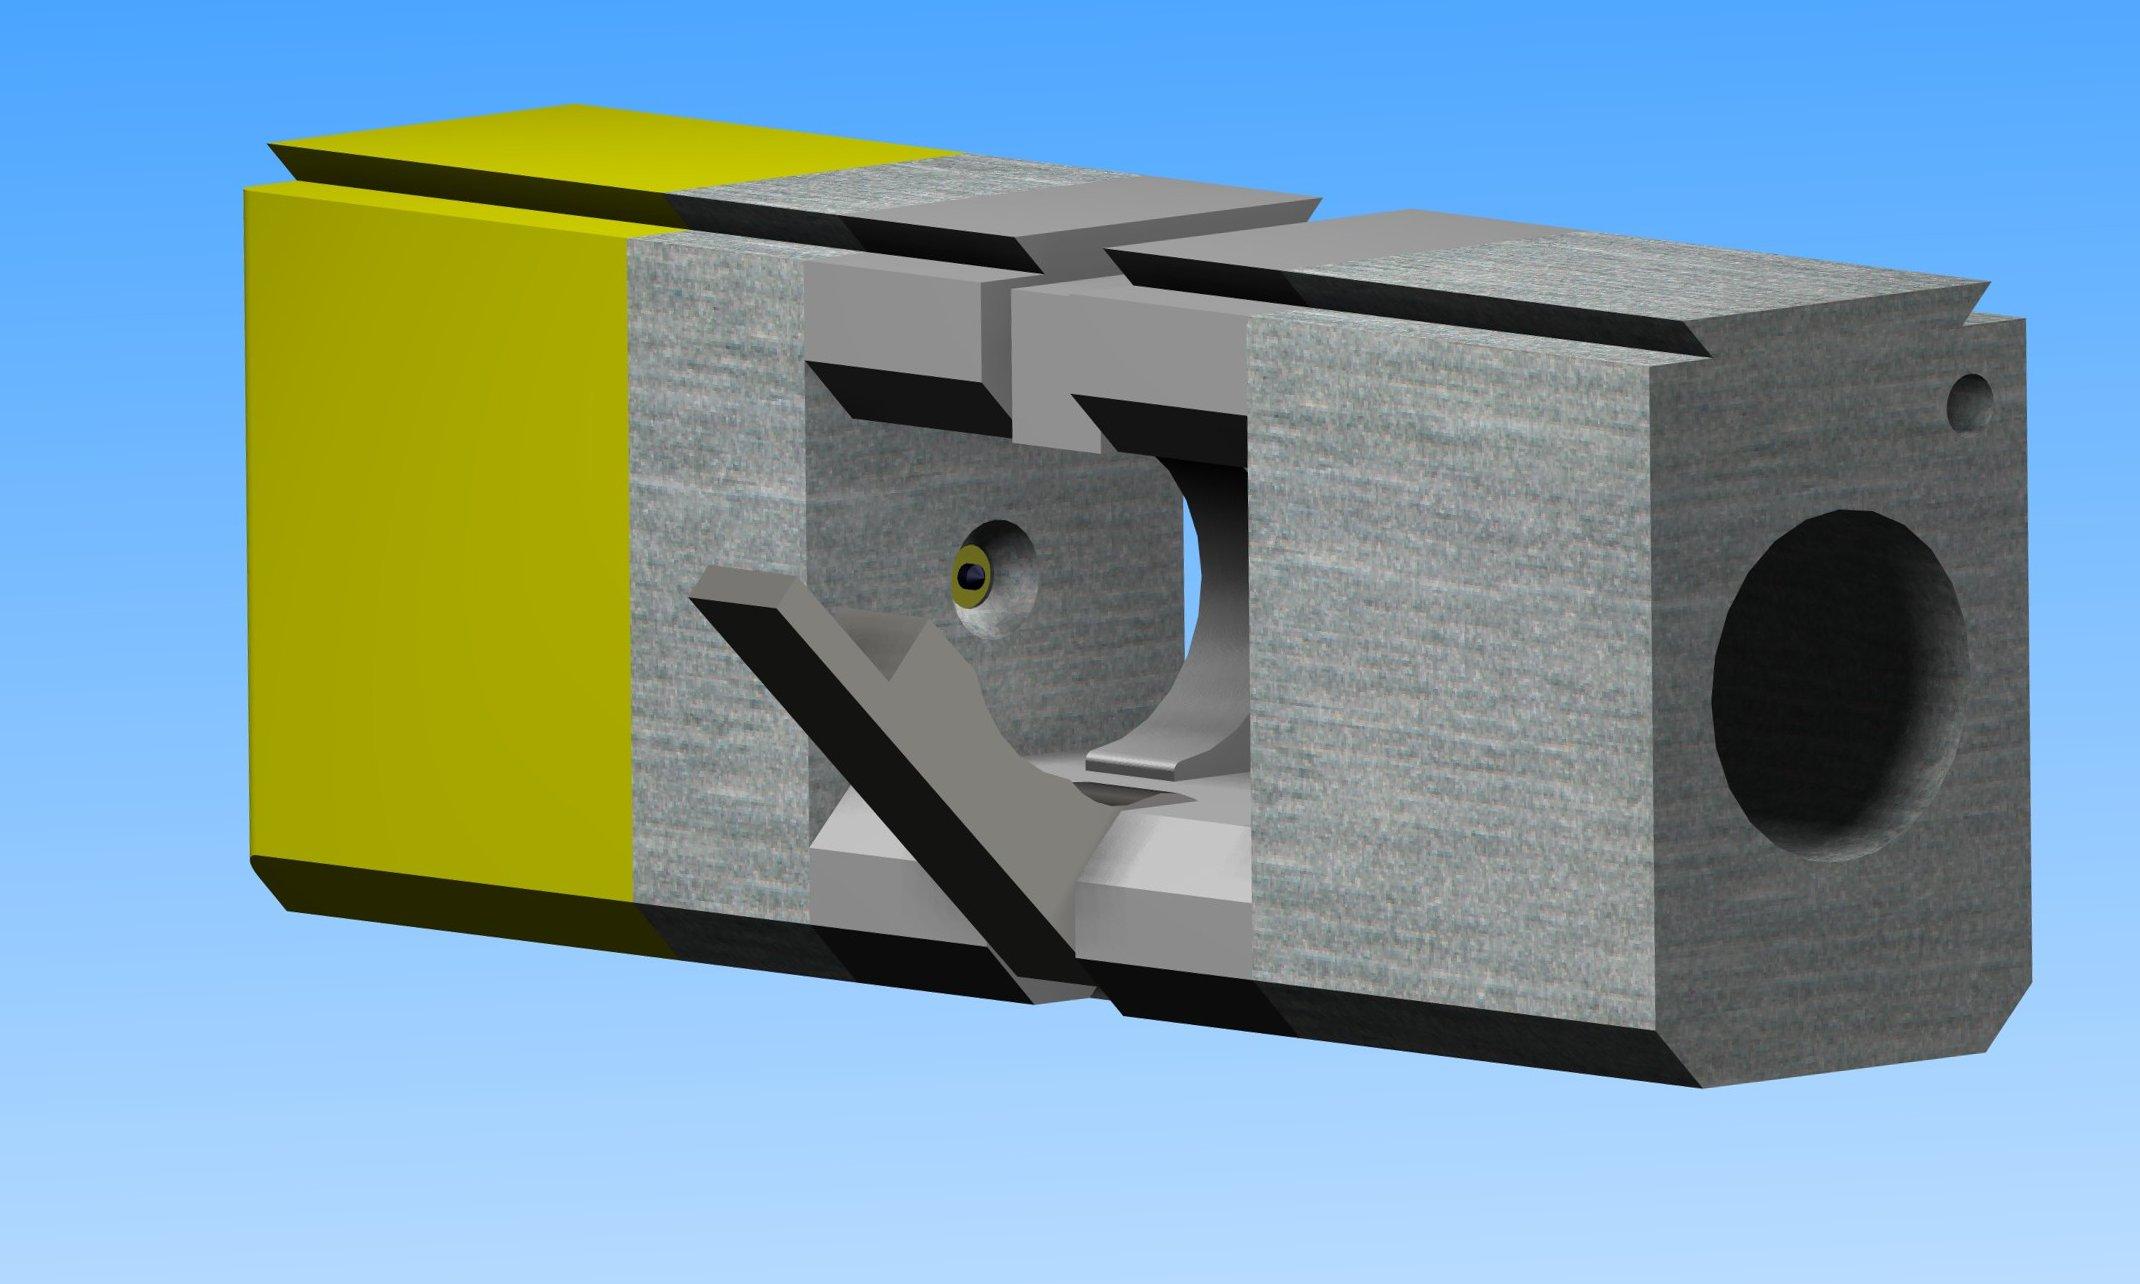 Construction of the Modular Muzzleloader